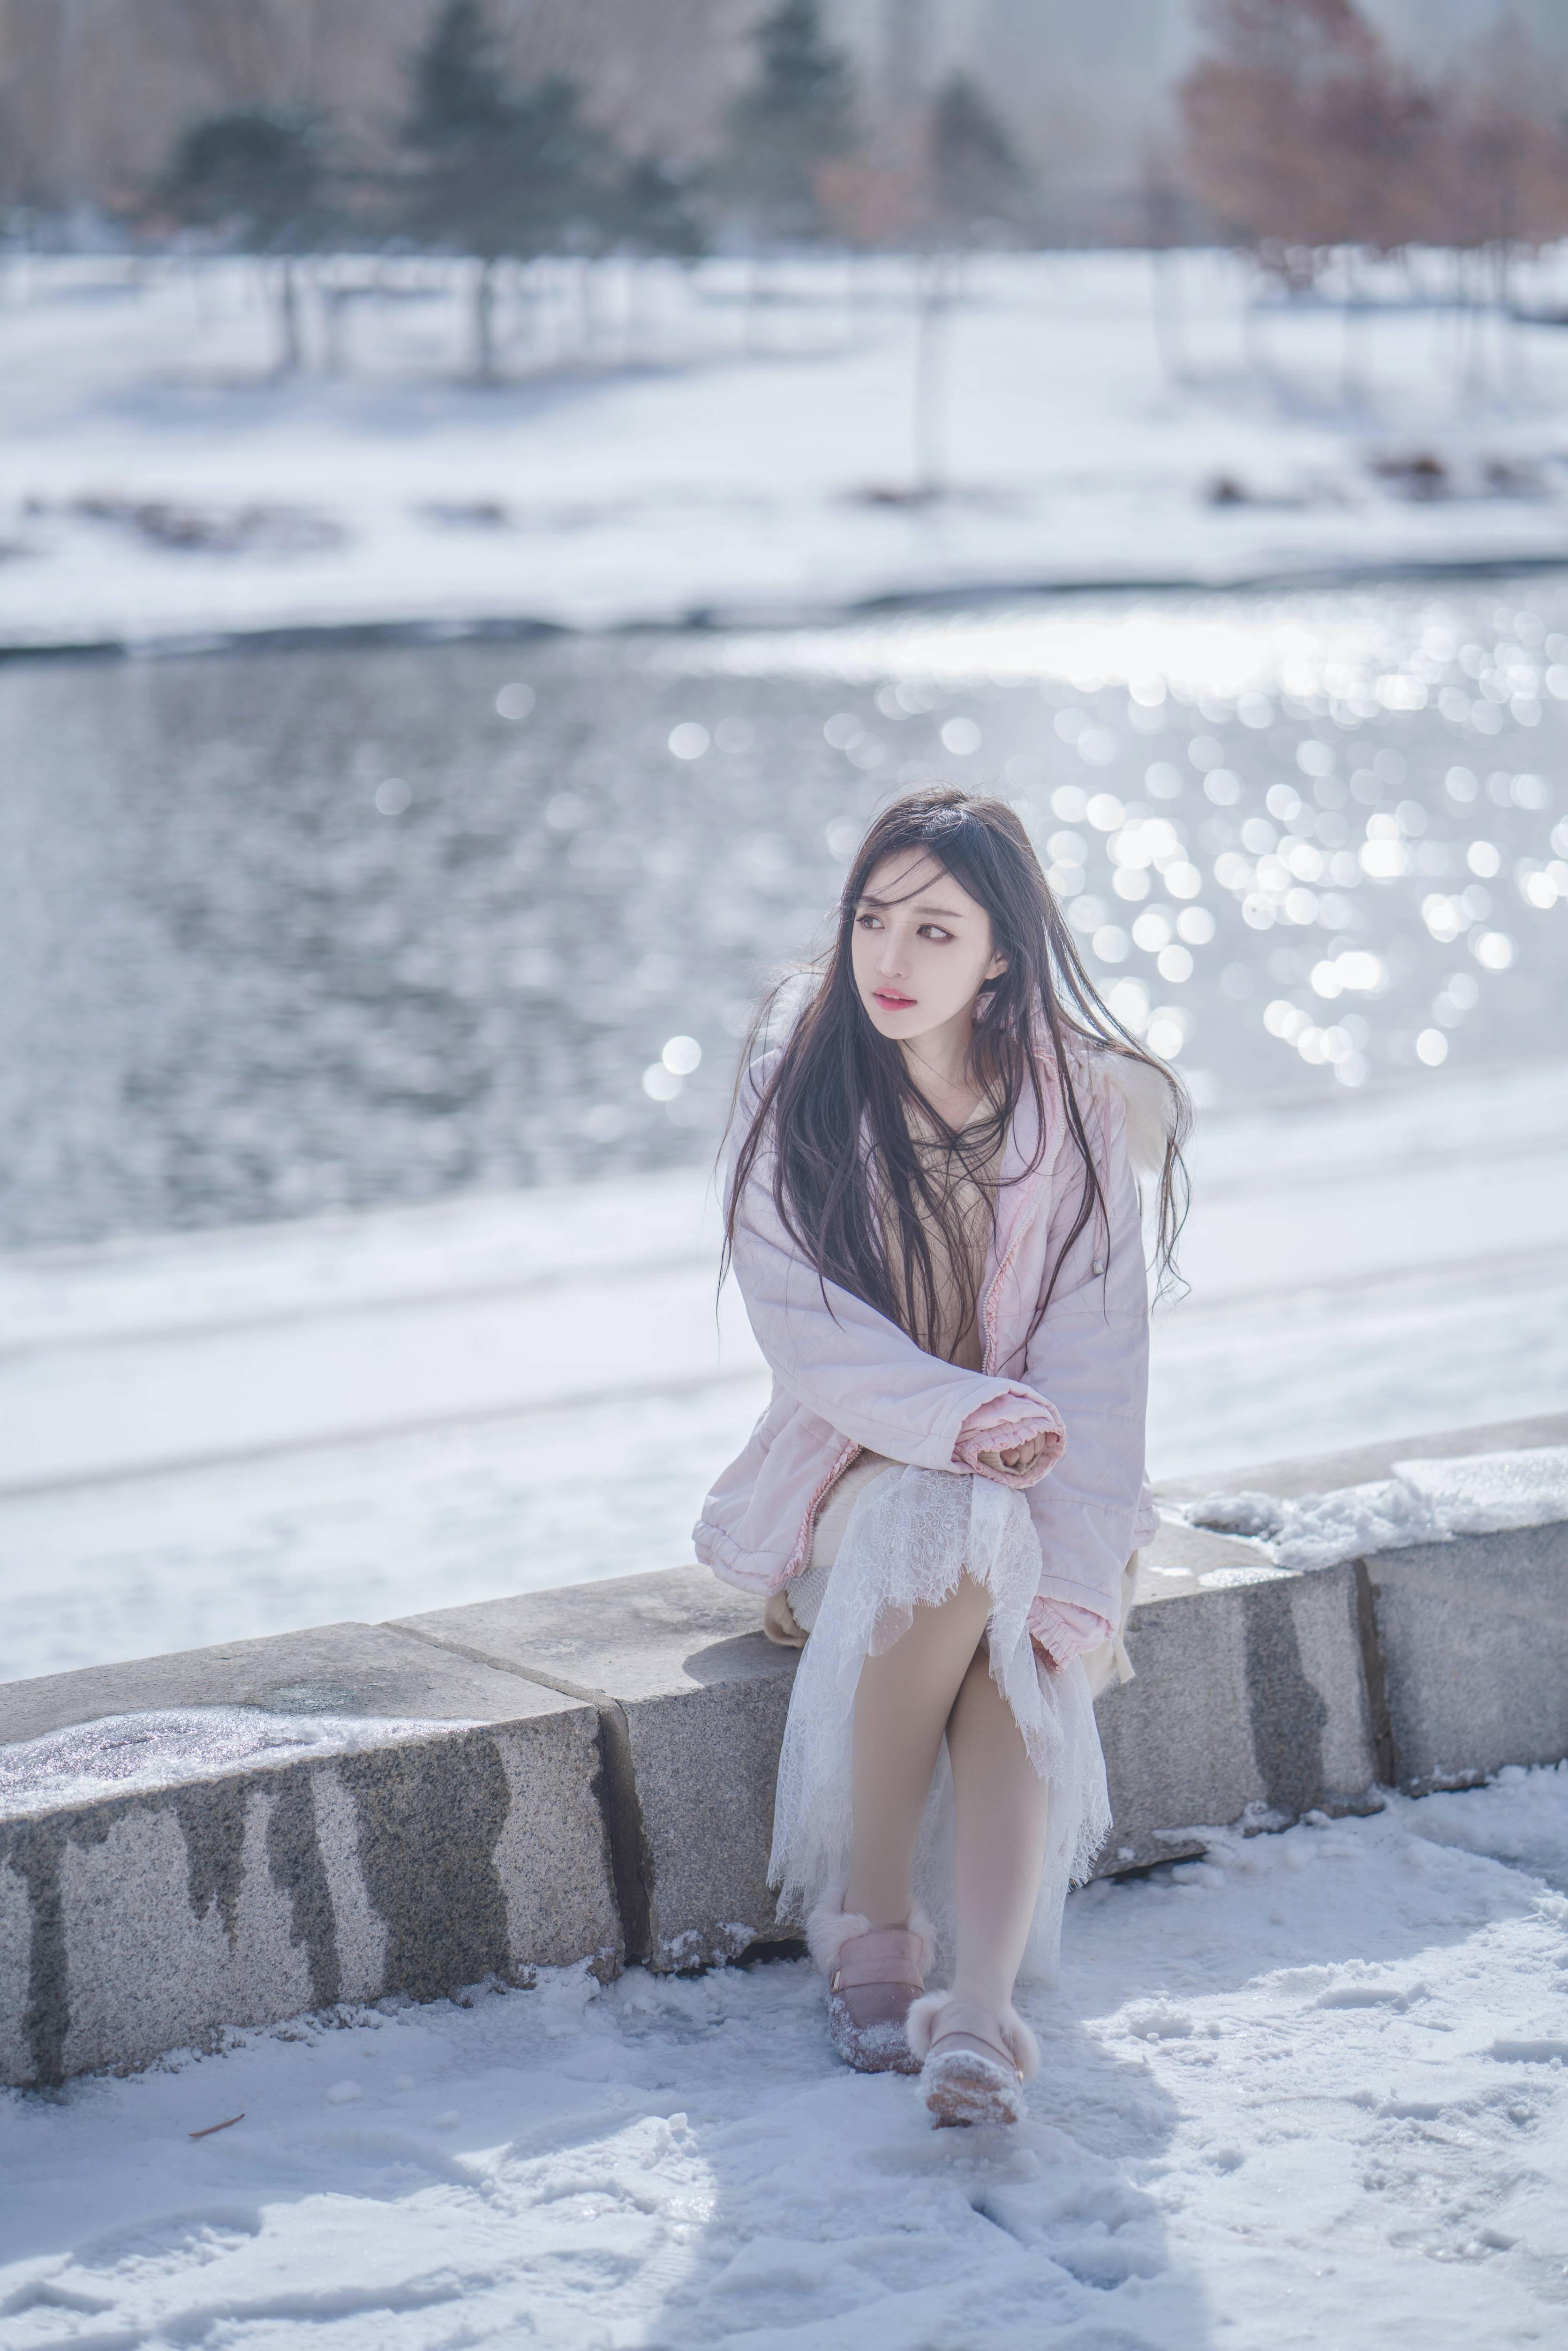 Shika小鹿鹿雪景写真,冬日里令你动容的精灵少女